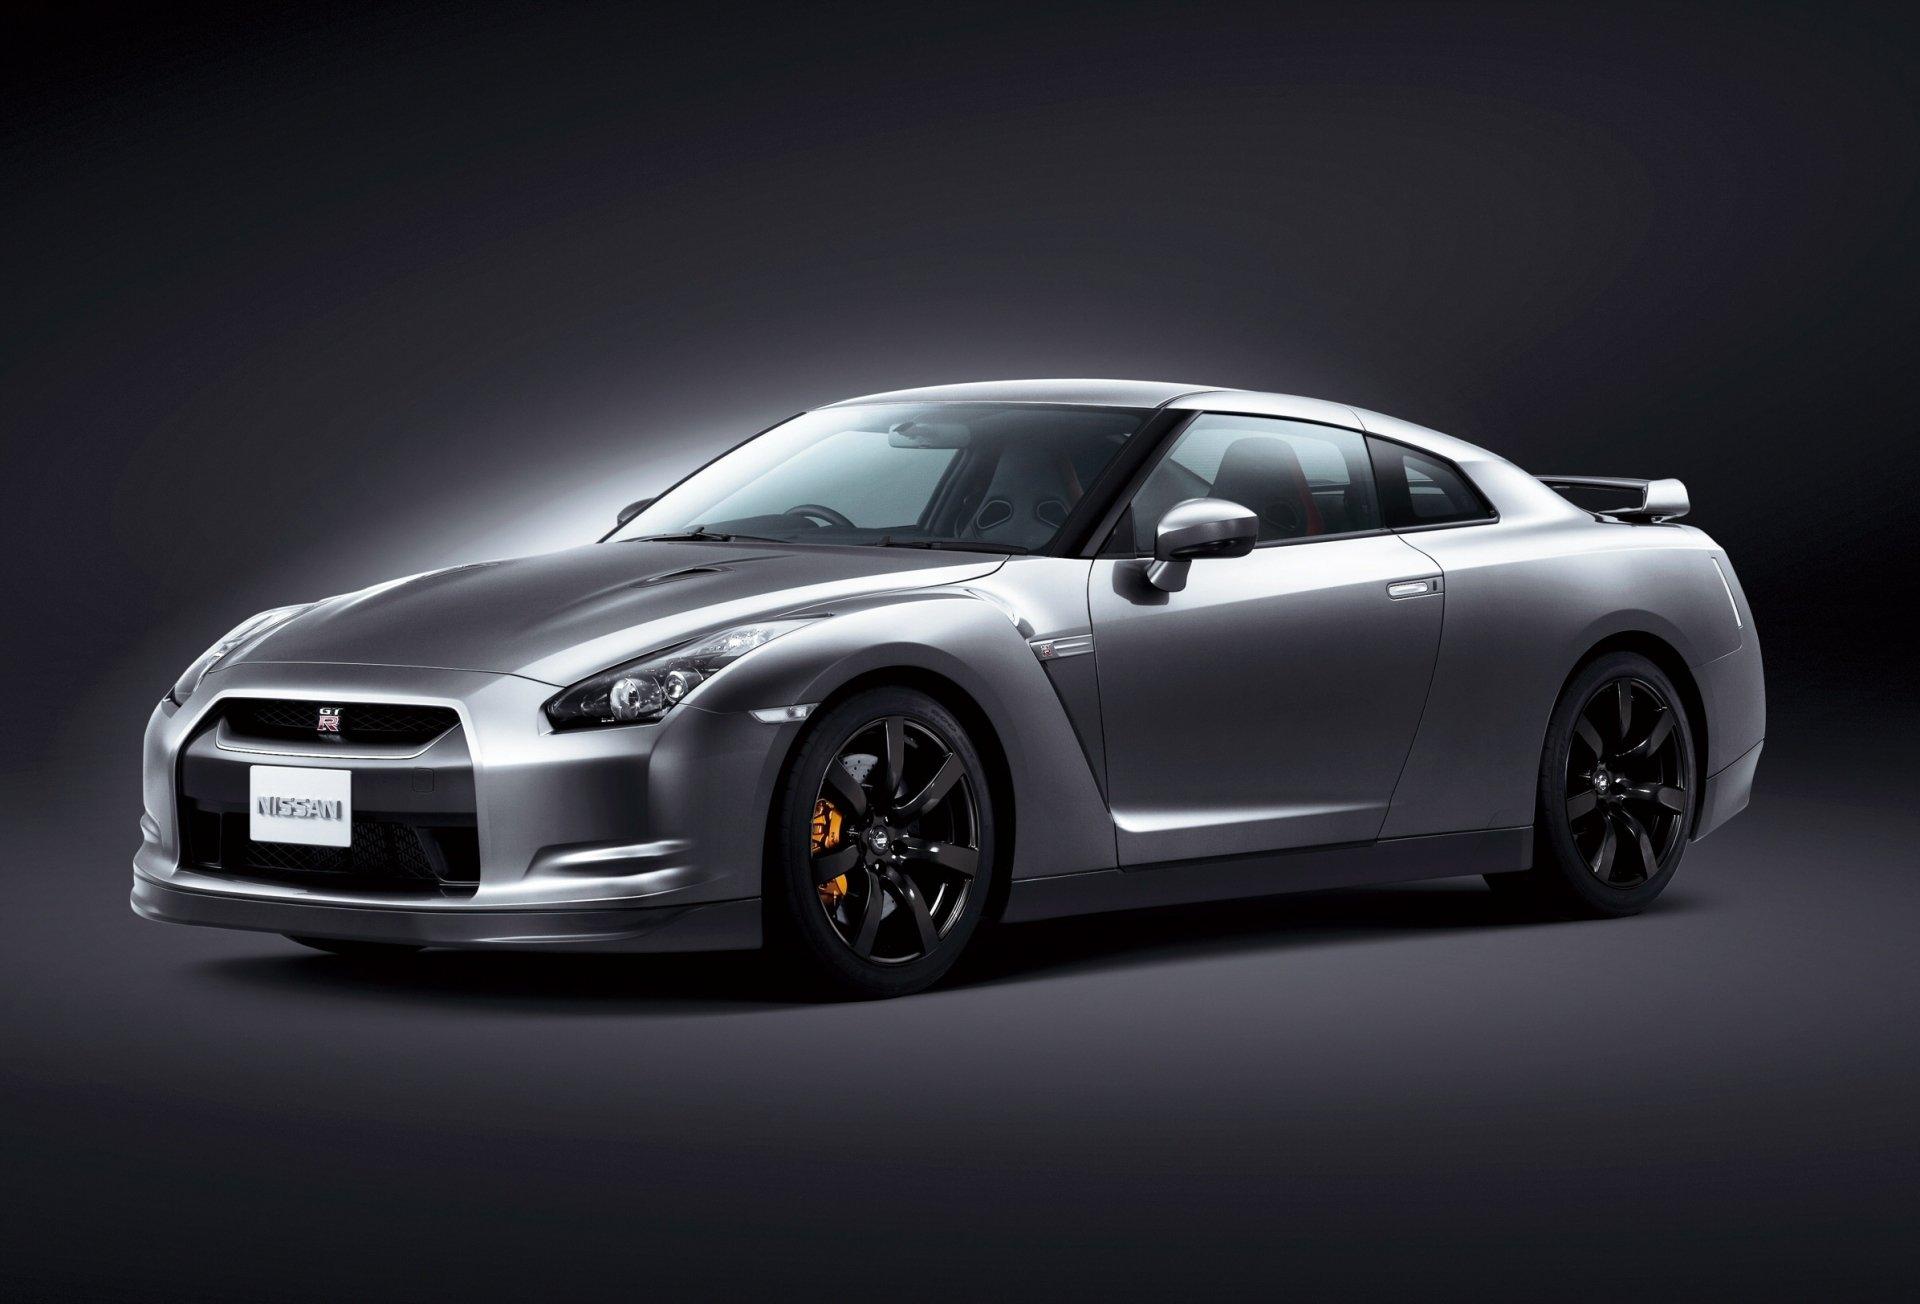 Vehicles - Nissan GT-R  Nissan Wallpaper